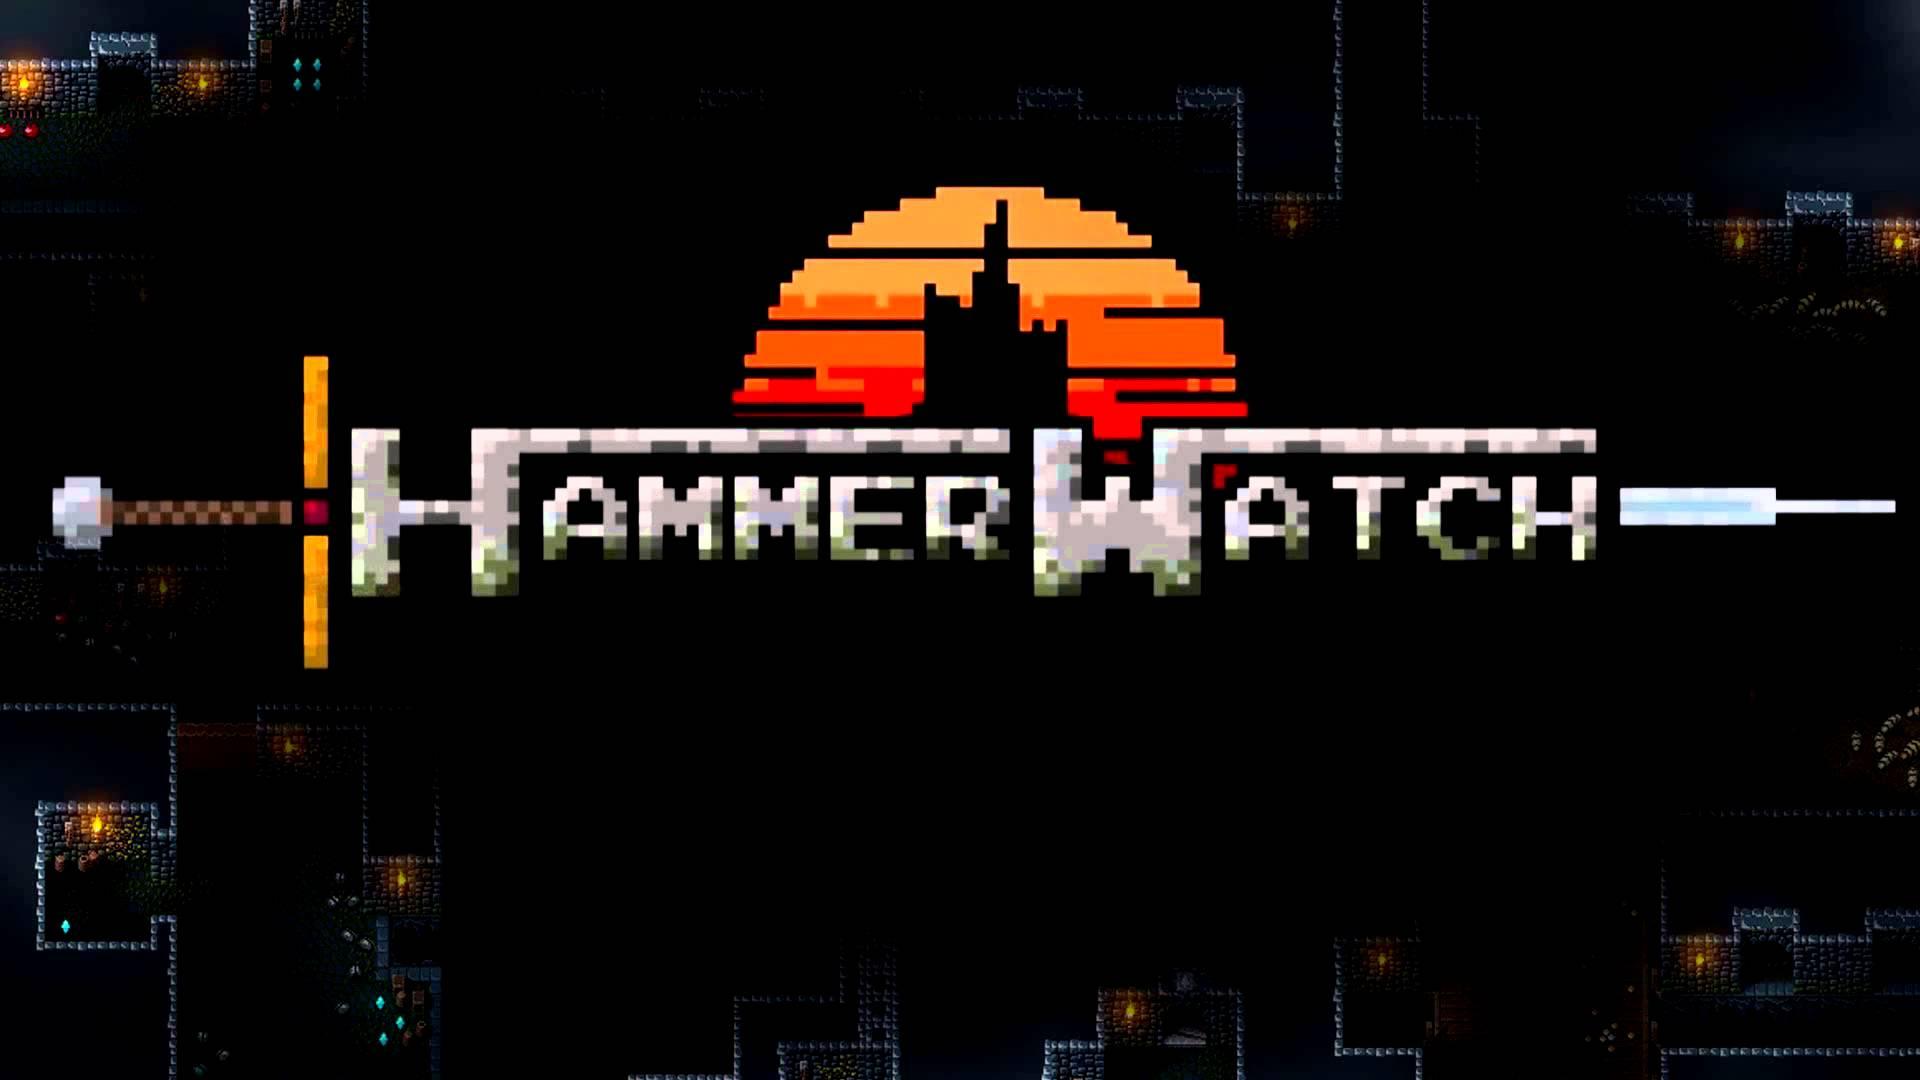 Hammerwatch HD wallpapers, Desktop wallpaper - most viewed